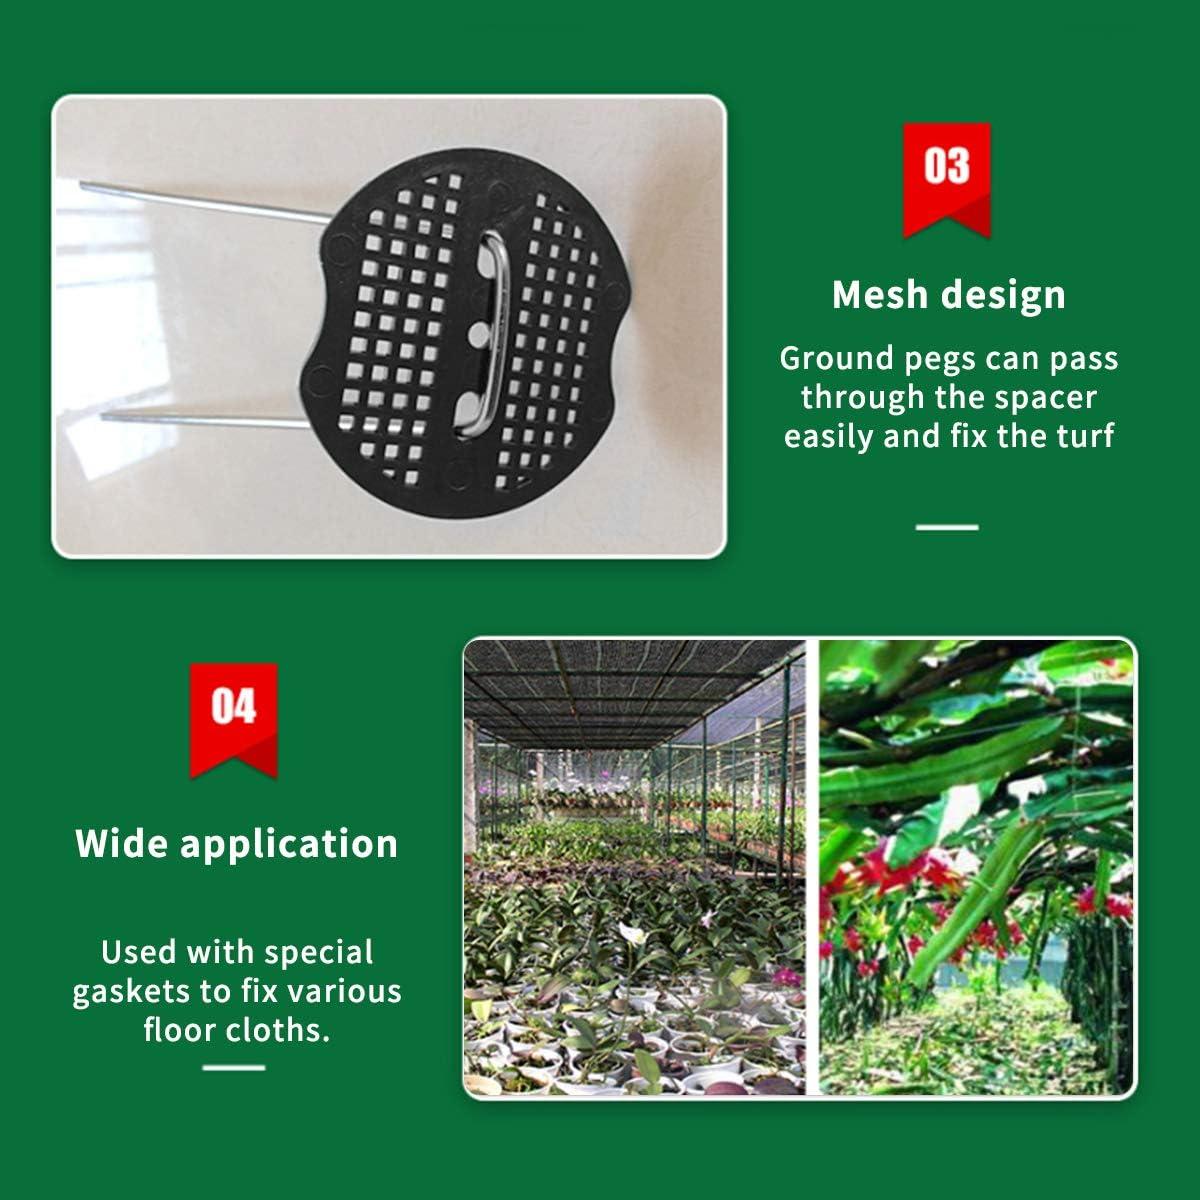 malla c/ésped artificial Buffer de malla arandelas para Weed membrana Aufisi 60 U clavijas de pl/ástico arandelas reutilizables Mats PP-materiales tela de jard/ín